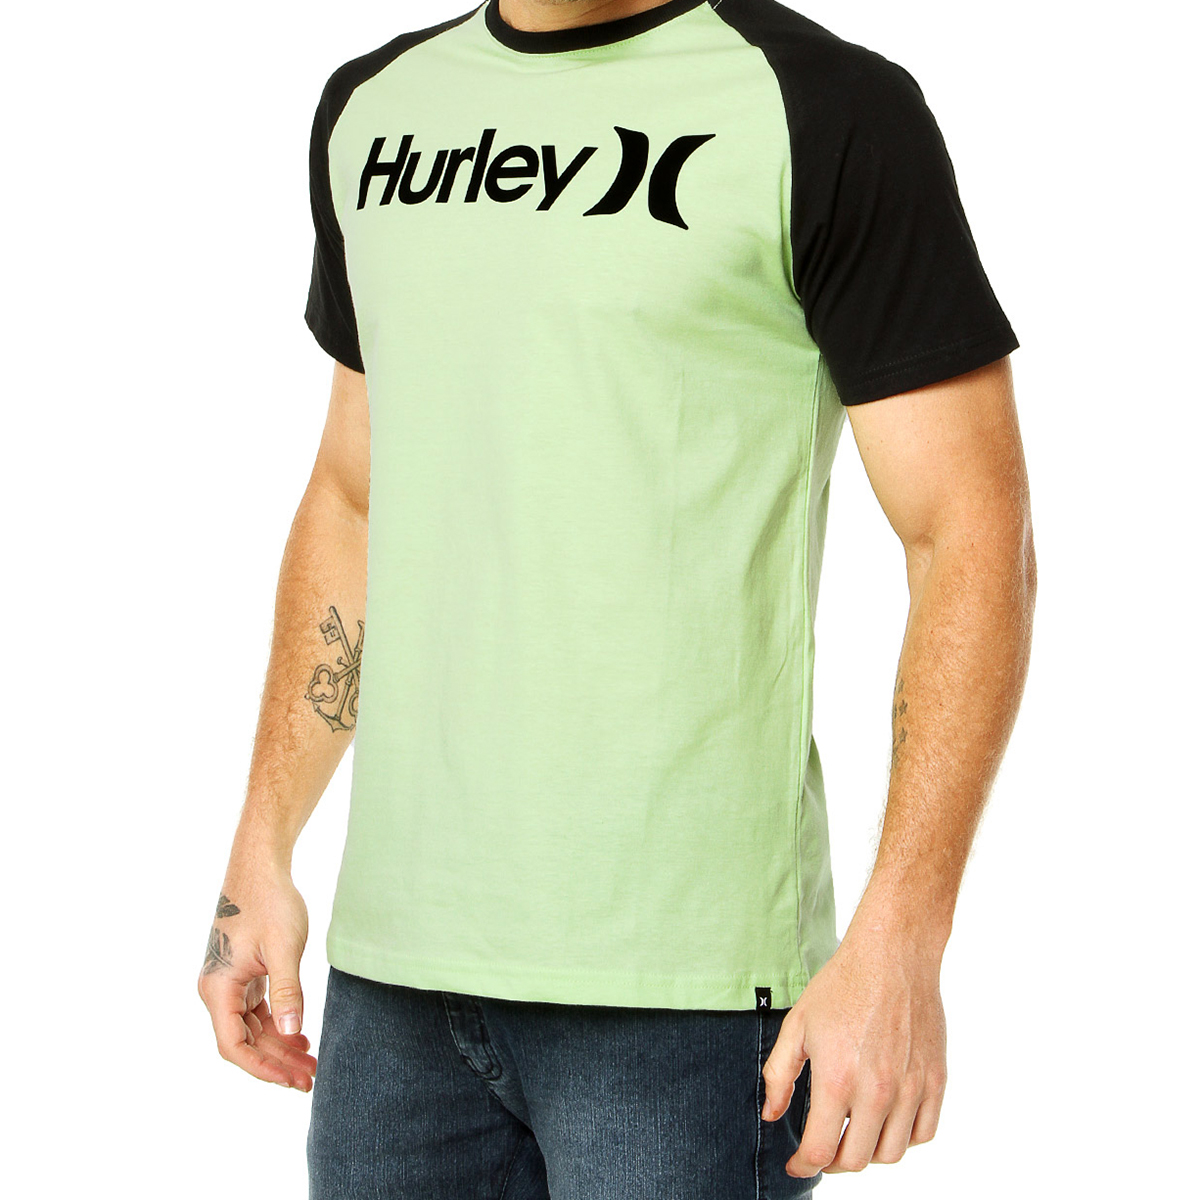 Camiseta Hurley One e Only Raglan Masculina - Verde